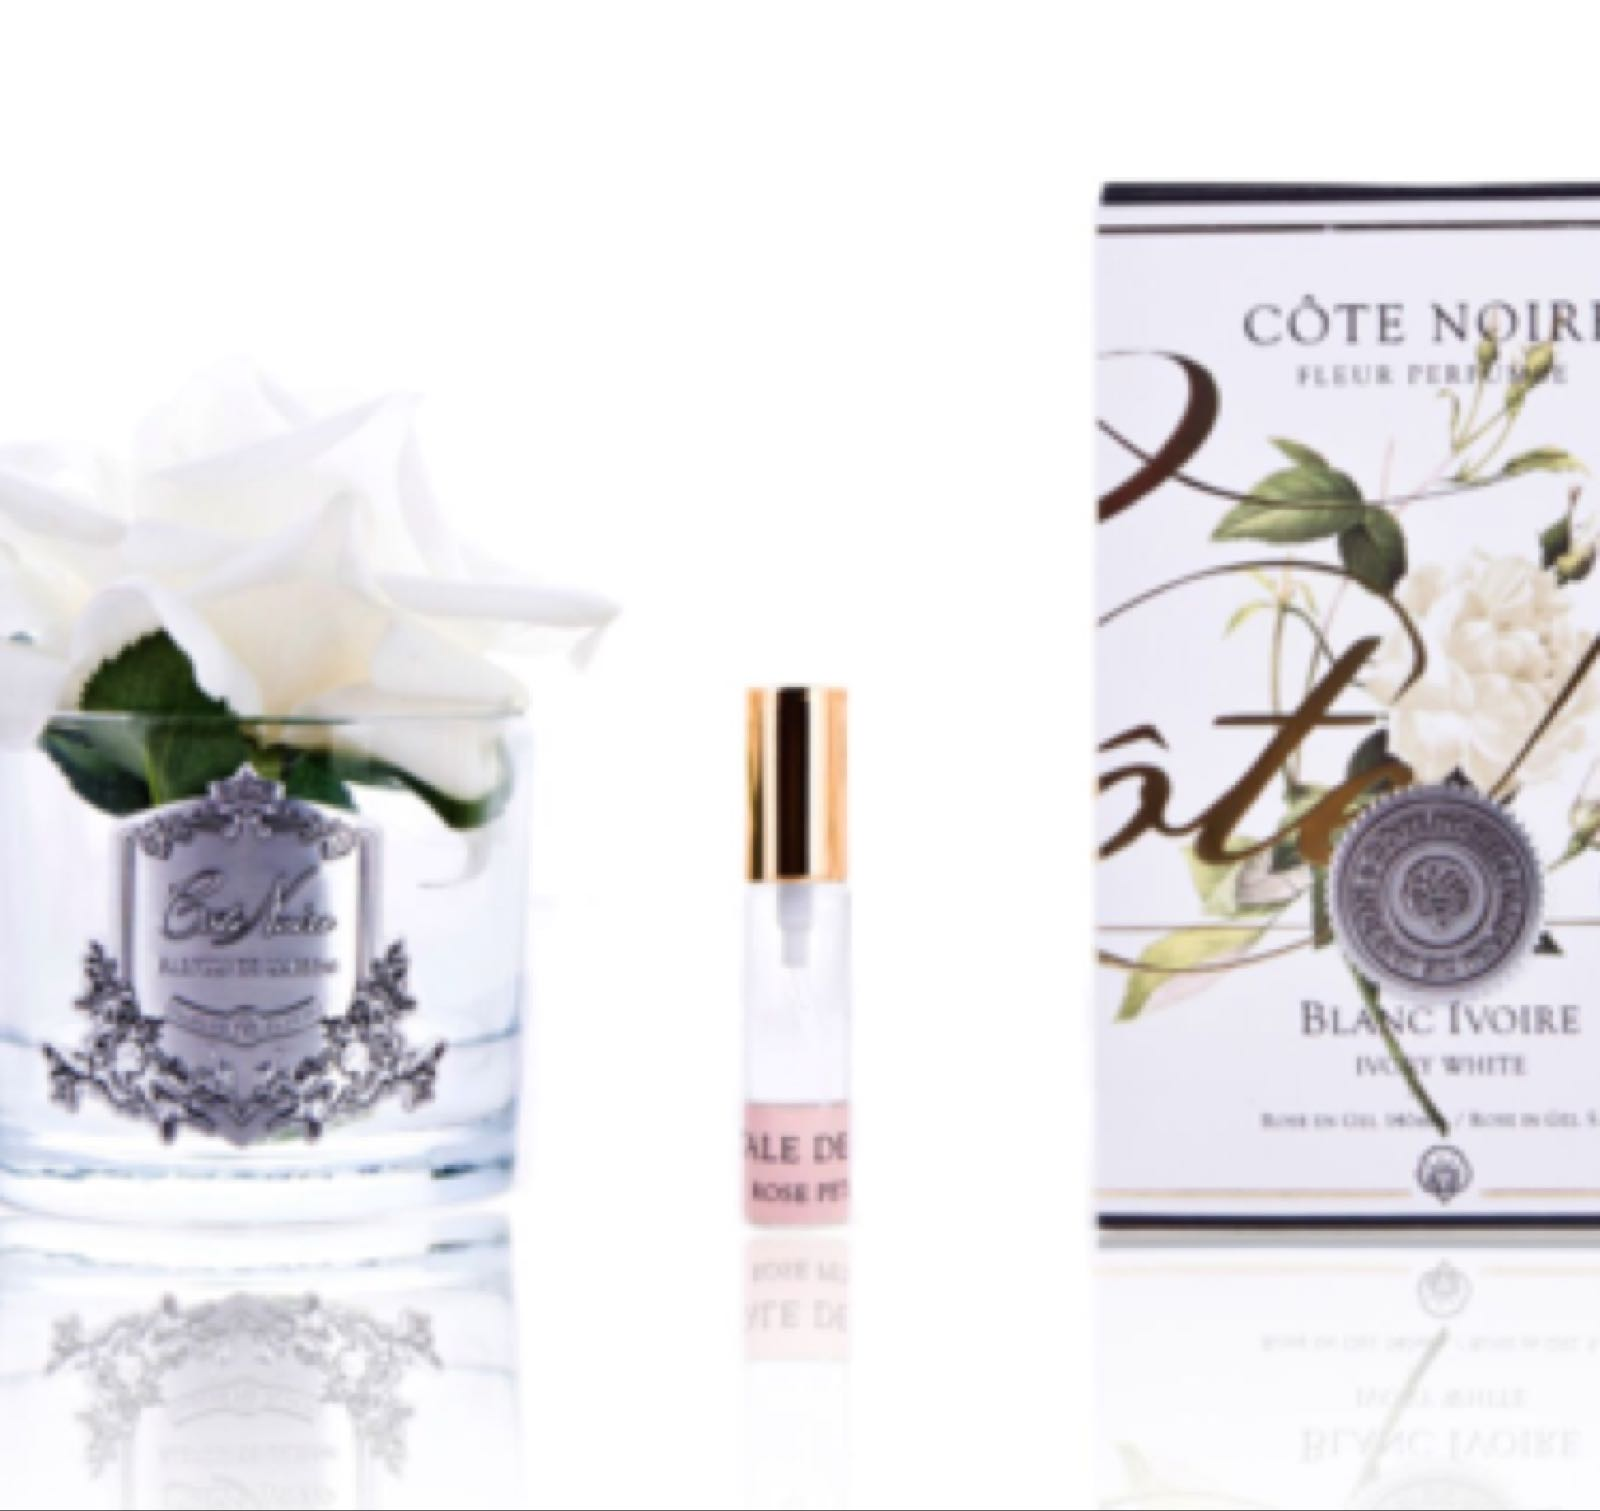 Cote noire Ivory white rose medium with fragrance